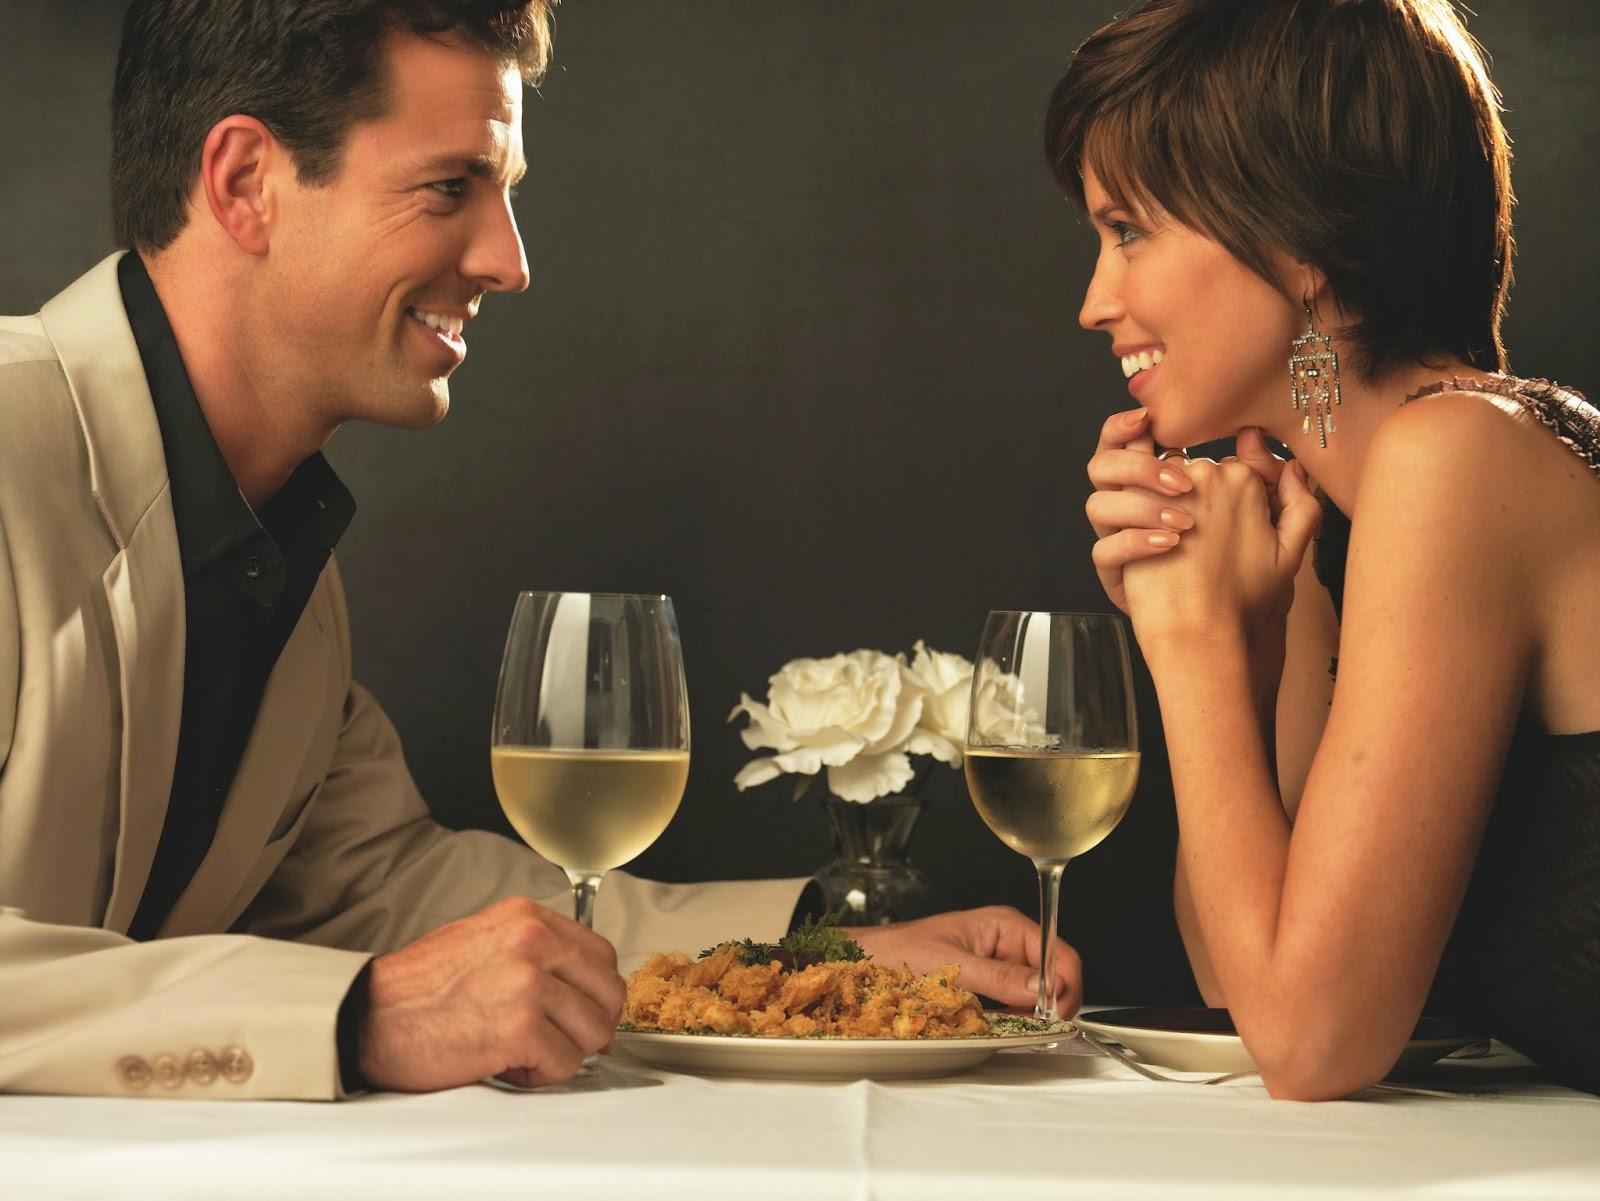 dinner date dating websites